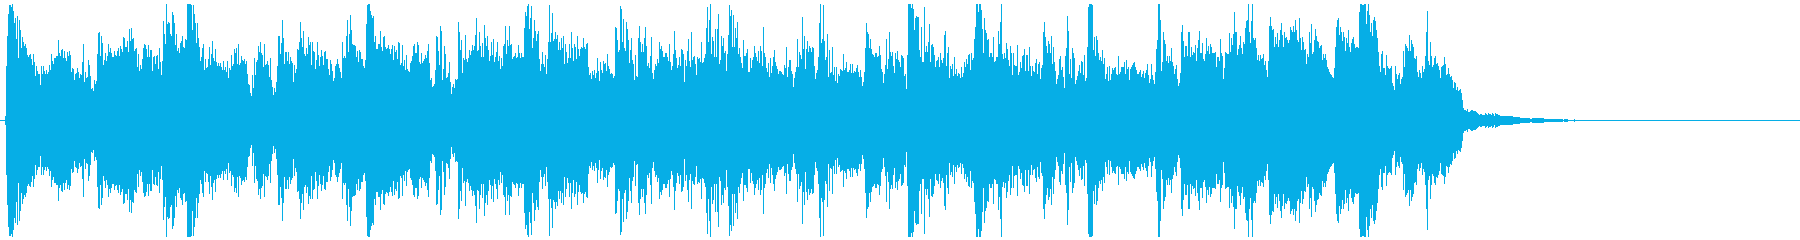 CM向け15秒ボサノバ■ややアップテンポの再生済みの波形